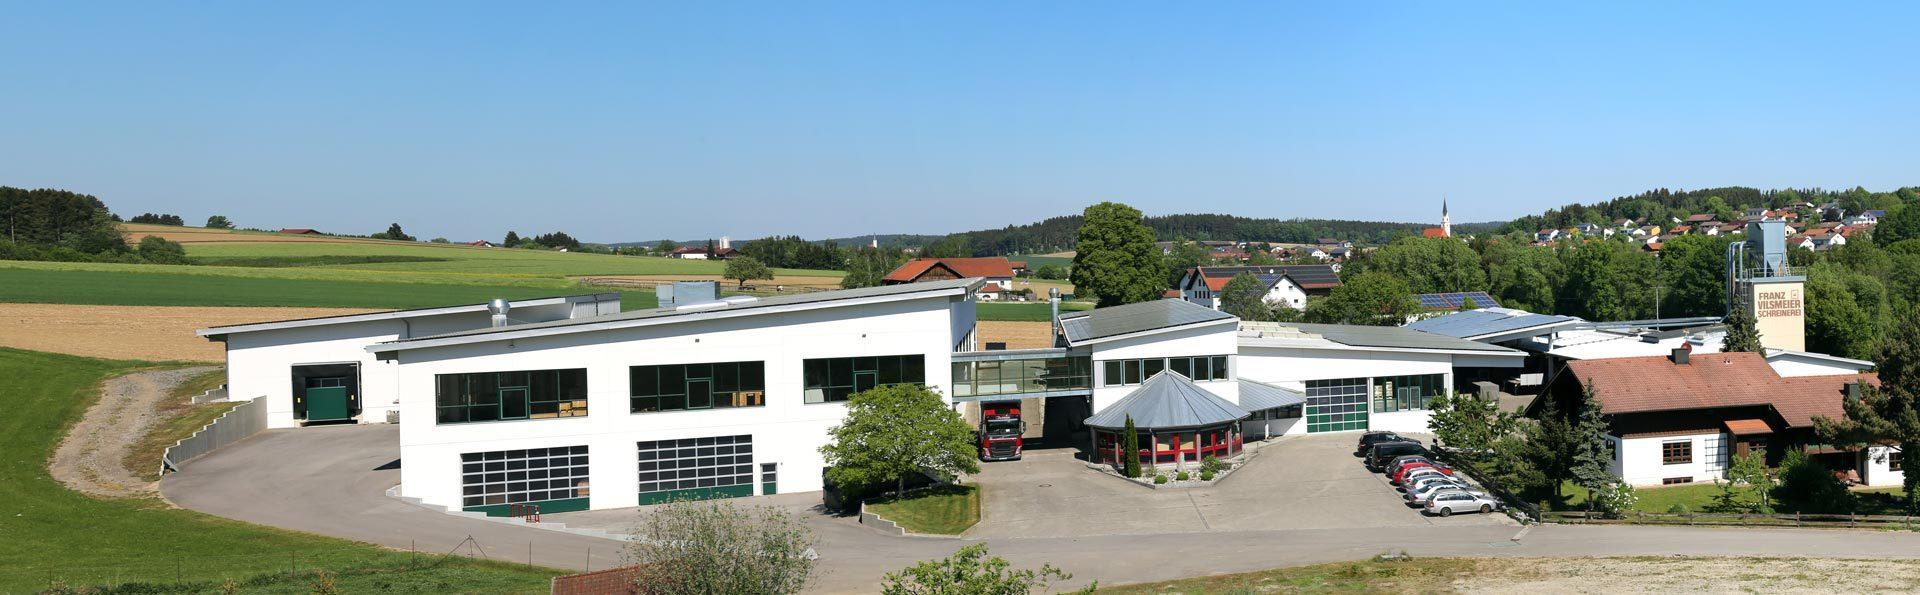 Schreinerei Vilsmeier in Eggenfelden